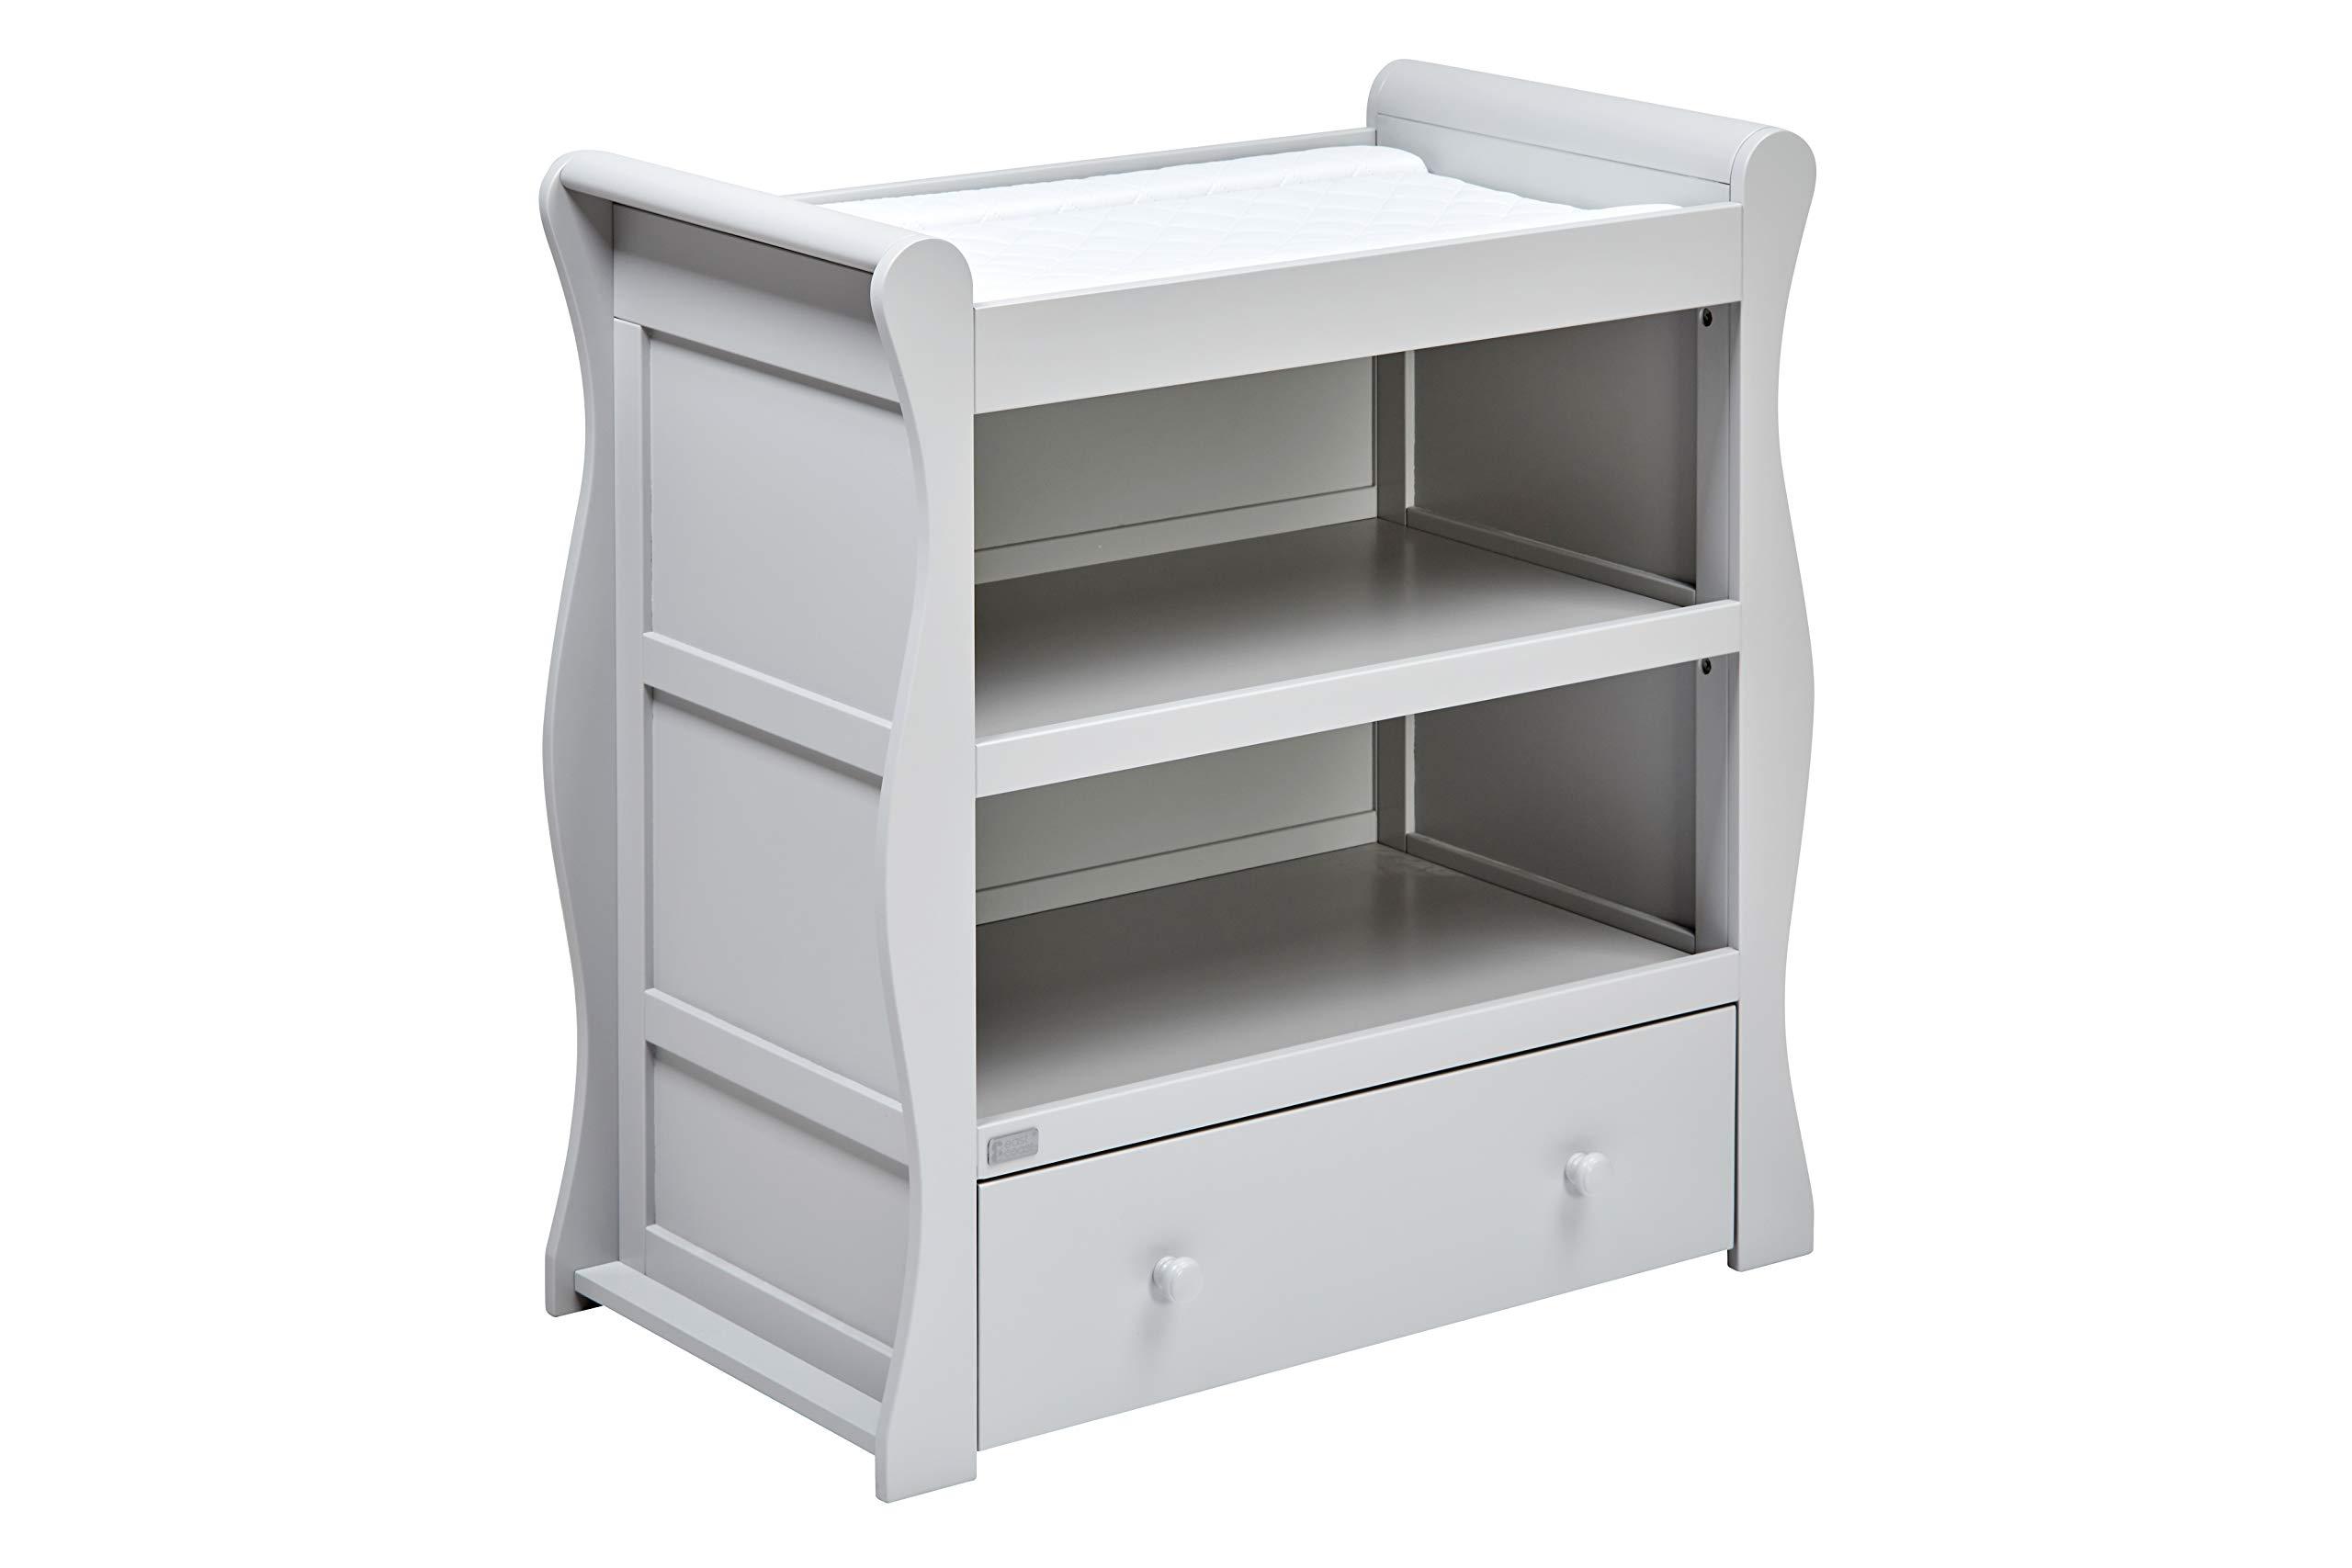 East Coast Nebraska Sleigh Dresser, Grey East Coast Integral changing area 1 Storage drawer 2 open storage areas 2